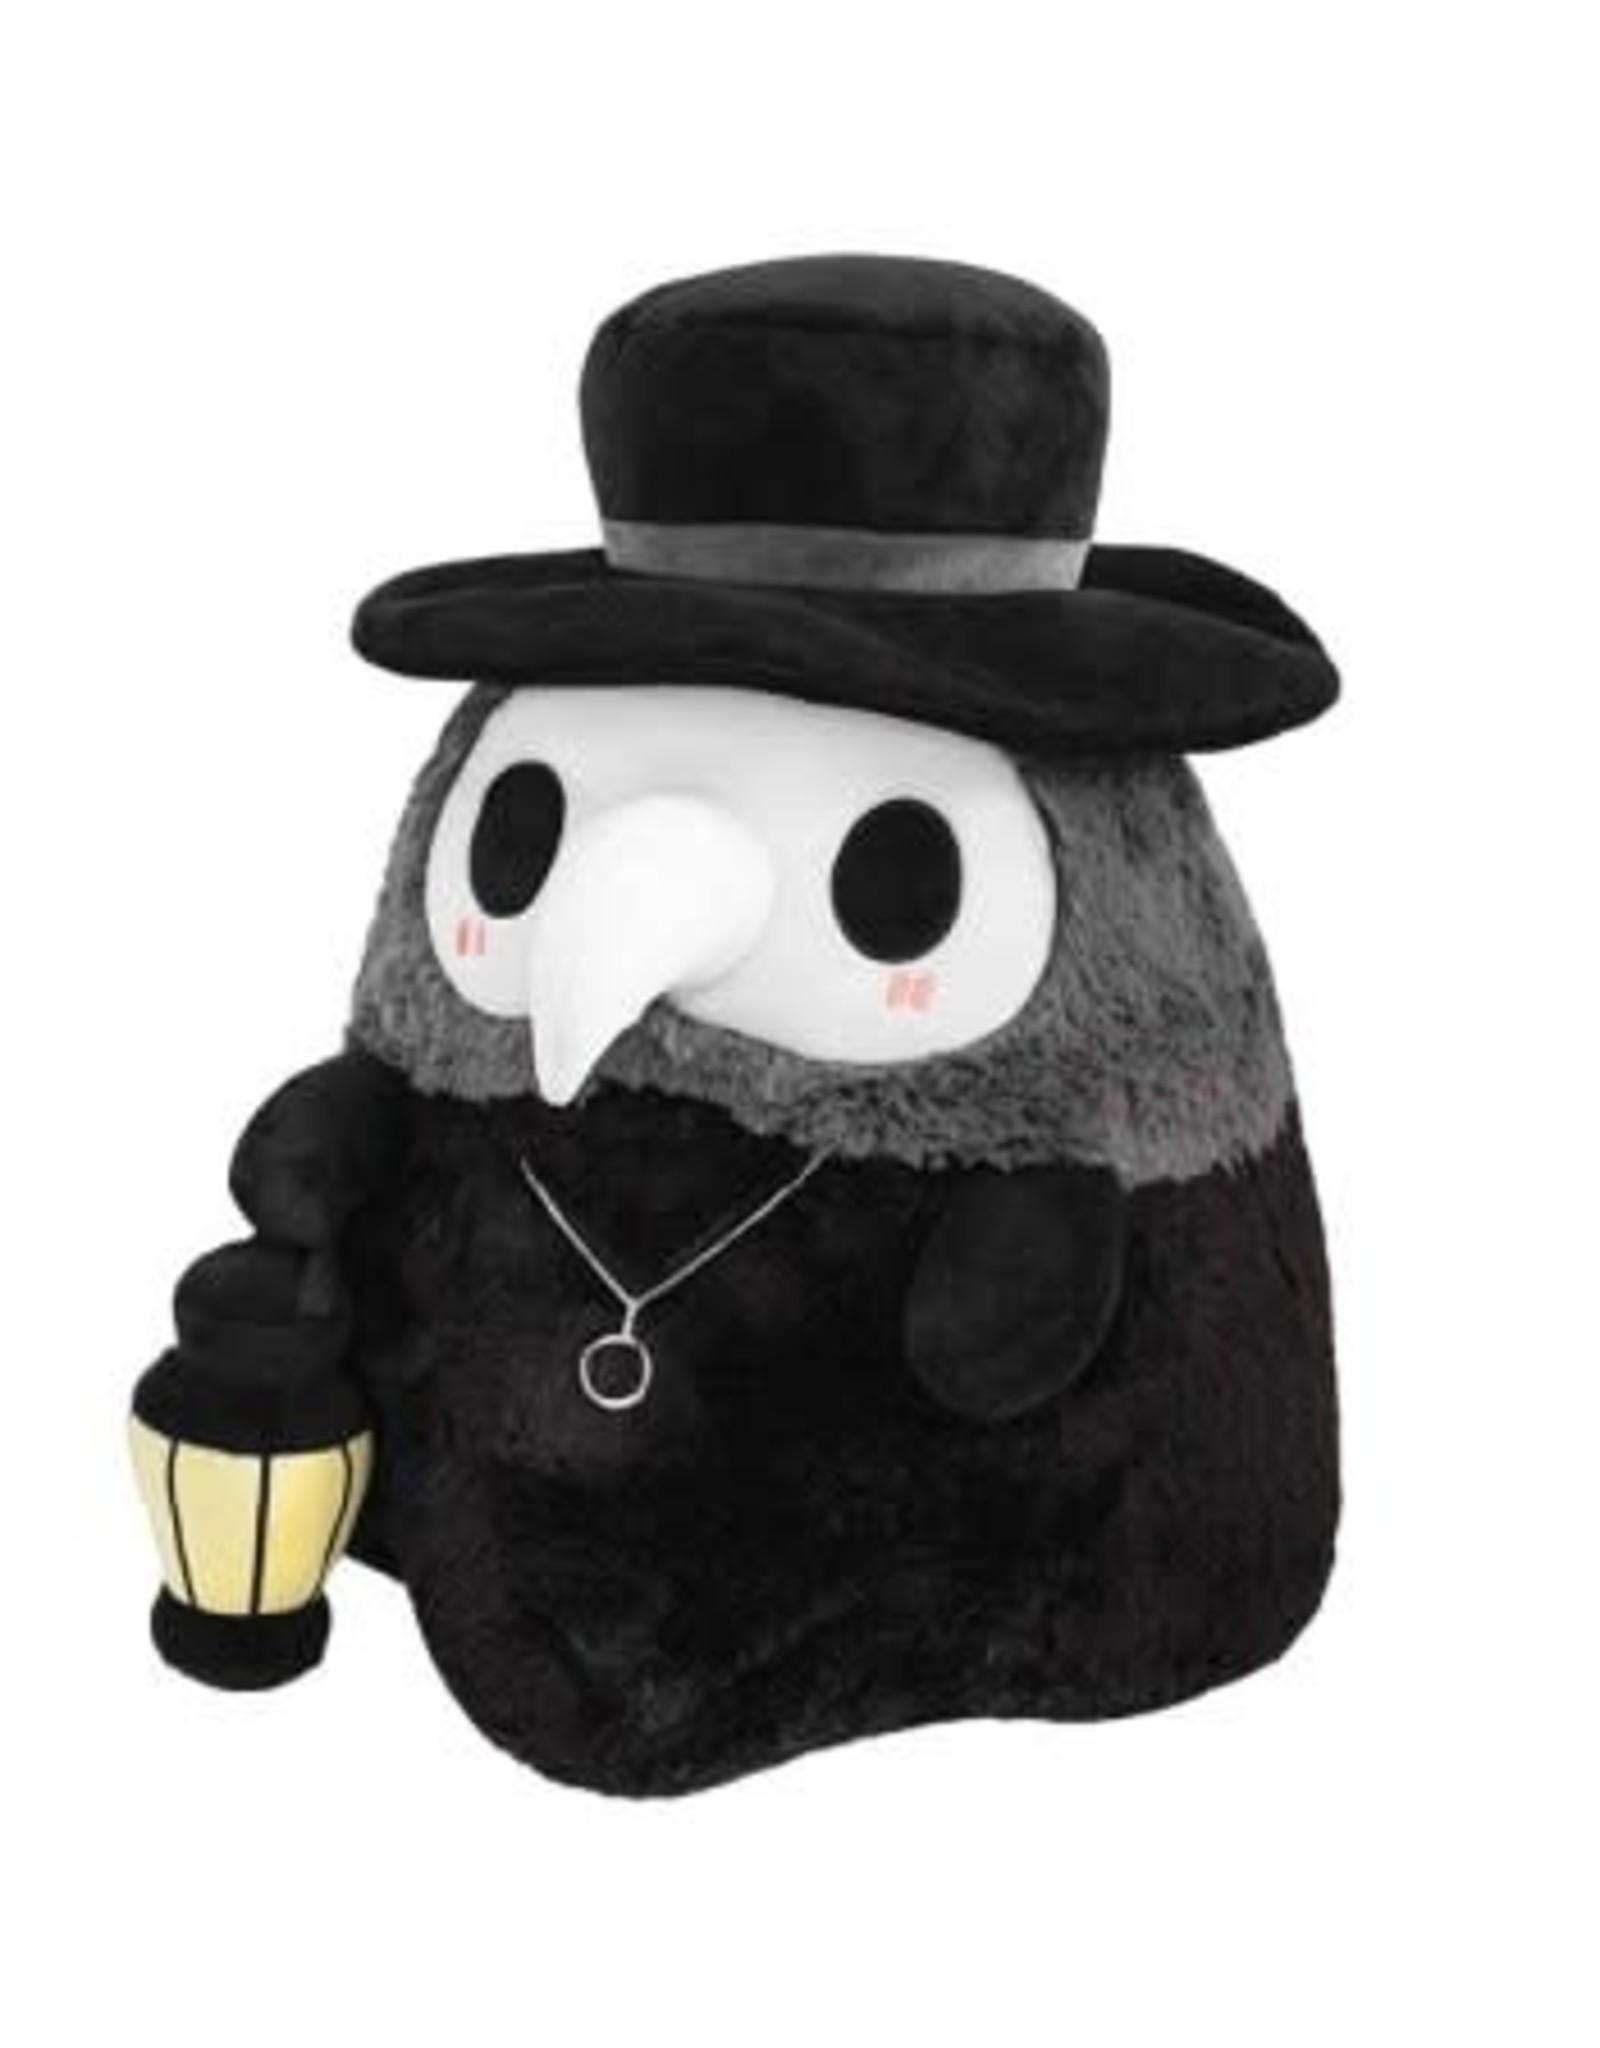 Squishable Squishable - Plague Doctor